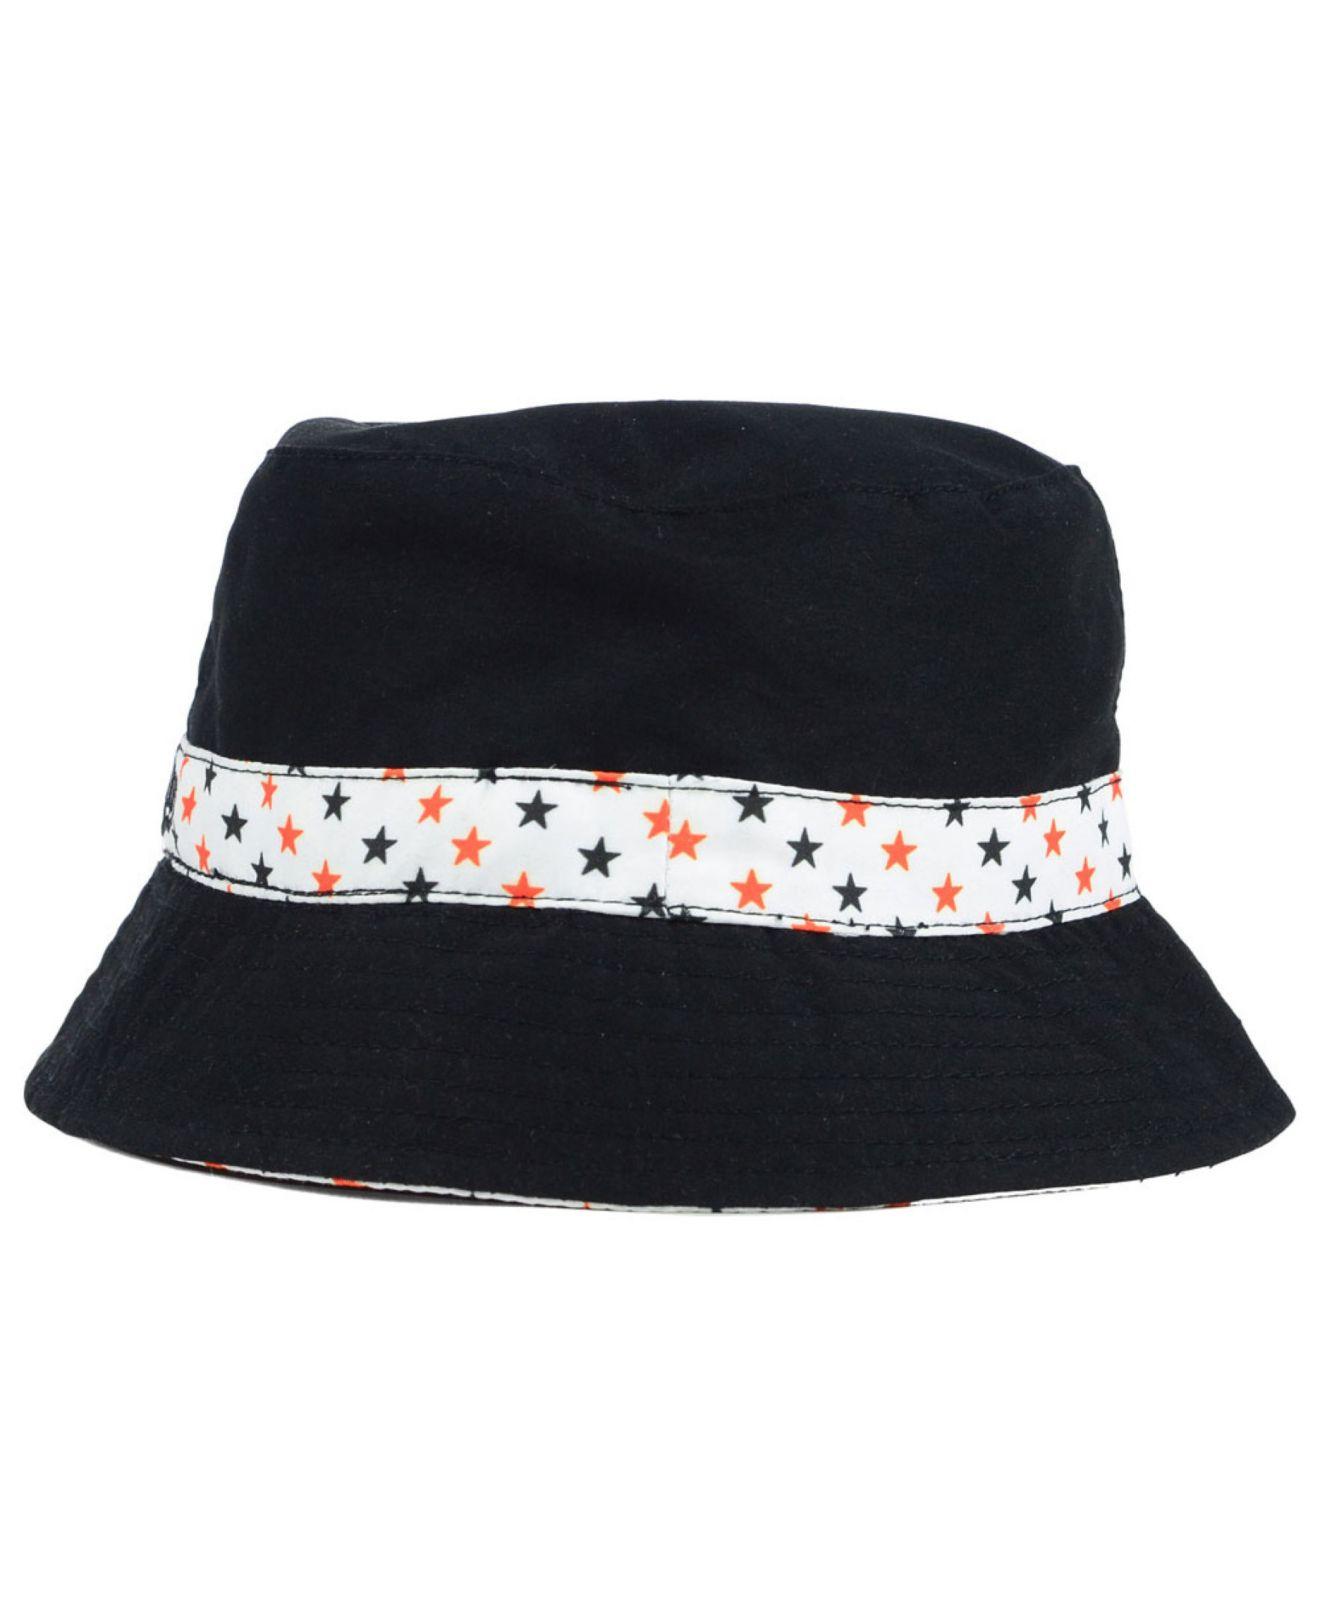 Lyst - KTZ Kids  Philadelphia Flyers Reversible Bucket Hat in Black 22d25c1ee5f